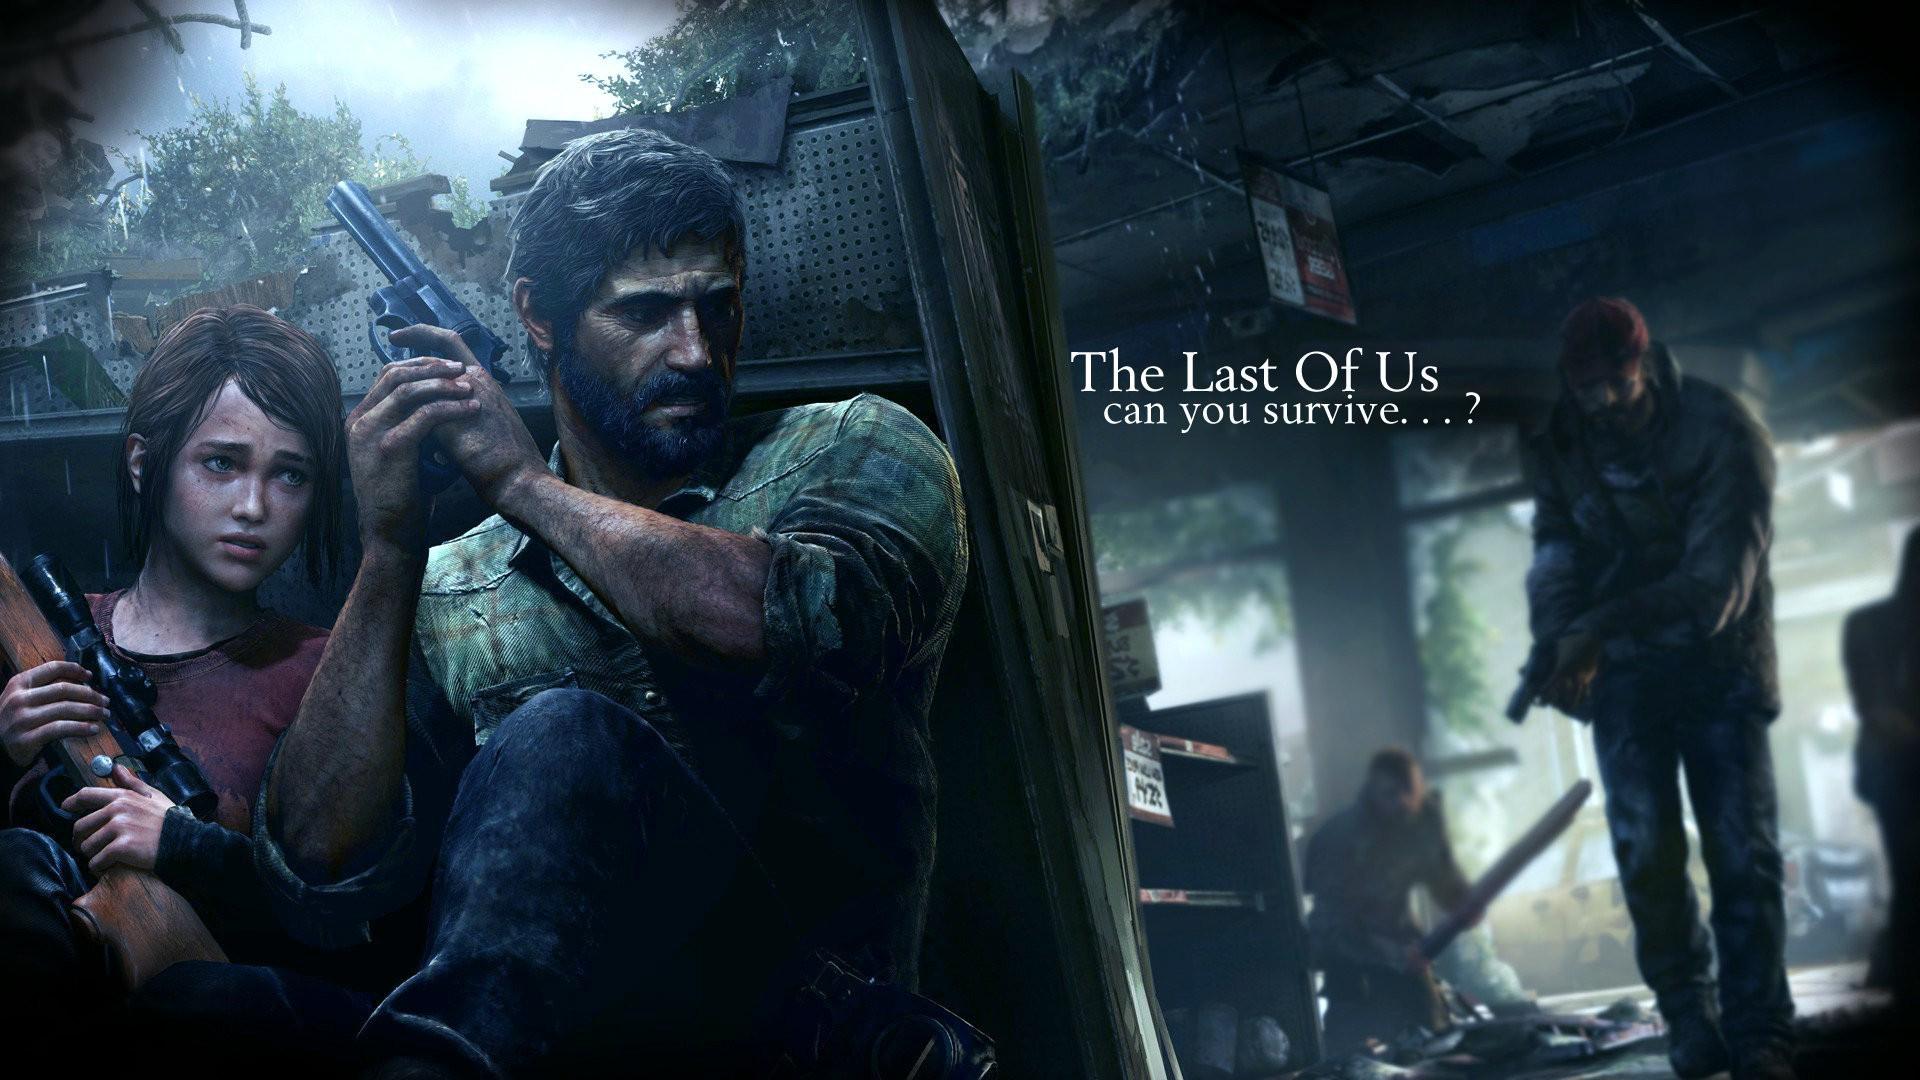 The Last of Us - Das Hörspiel gratis